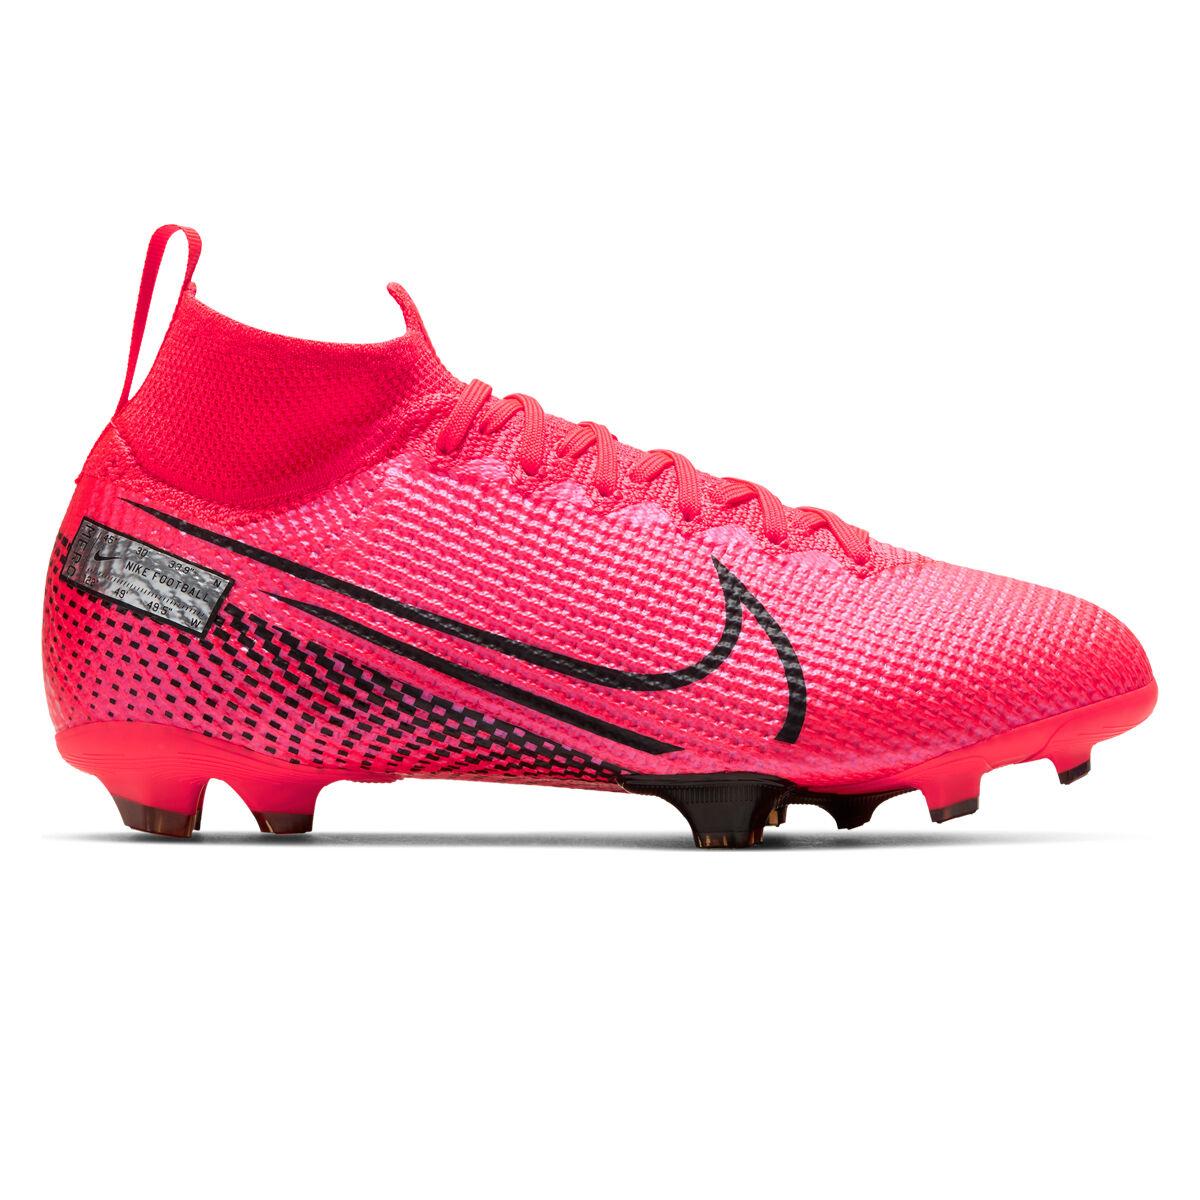 nike football boots mercurial black off 64% trinovo.se